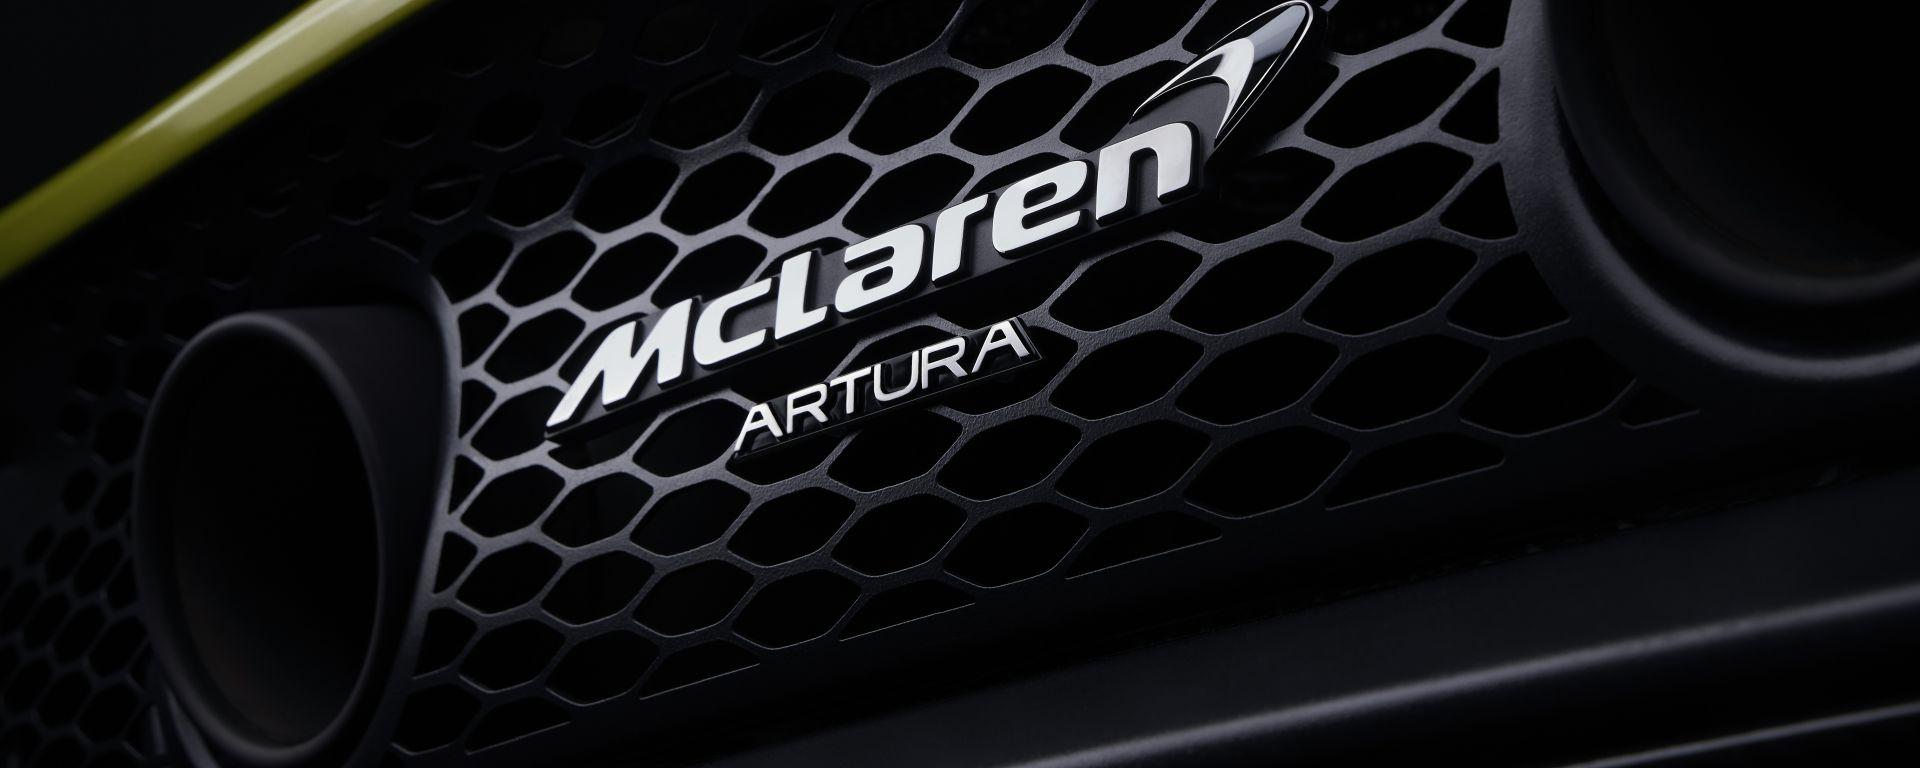 McLaren Artura, primo teaser